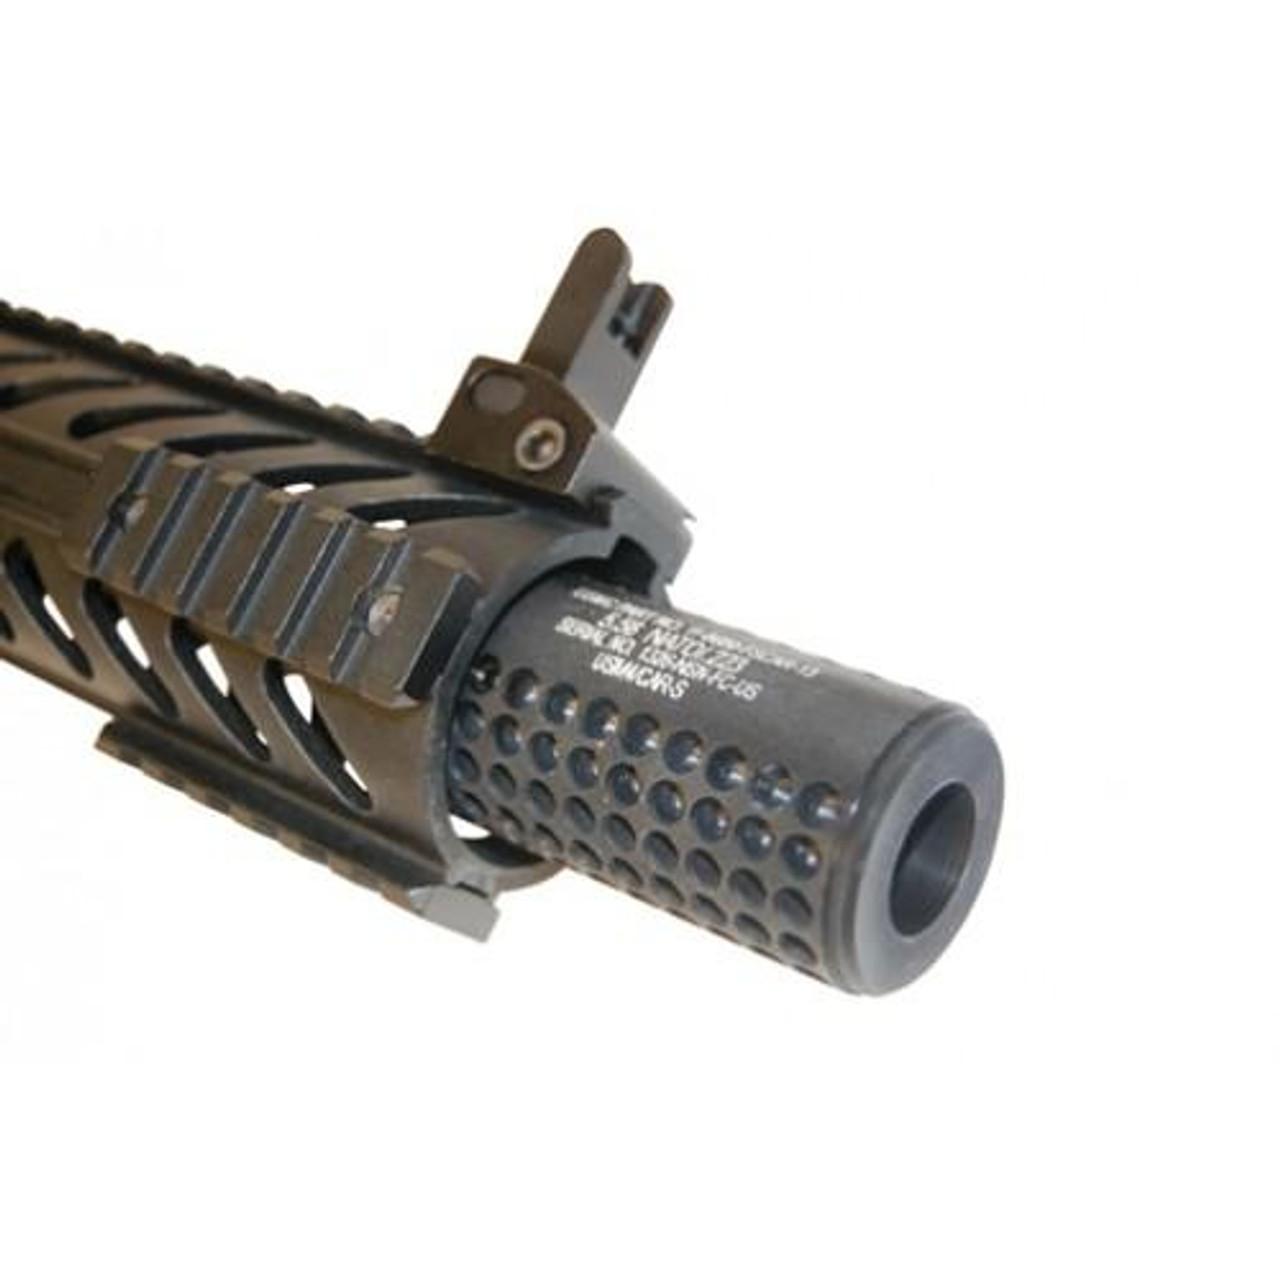 AR-15 GEN 2 MICRO REVERSE THREAD SLIP OVER SOCOM STYLE FAKE SUPPRESSOR